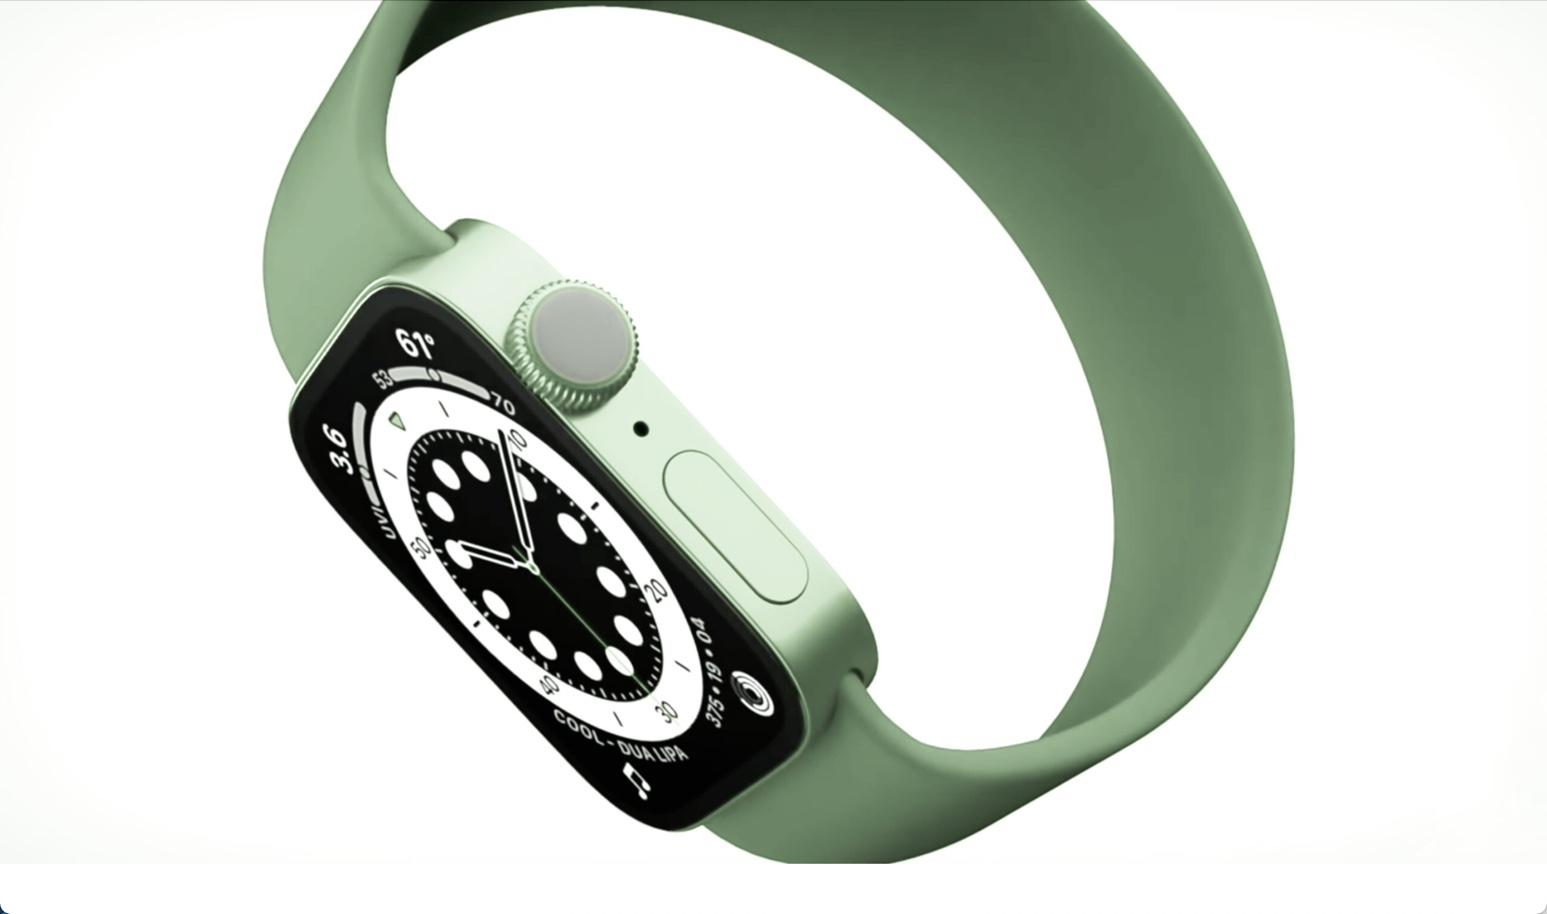 Apple Watch Series 7にはフラットエッジデザインが採用され、新色のグリーンが追加される可能性が